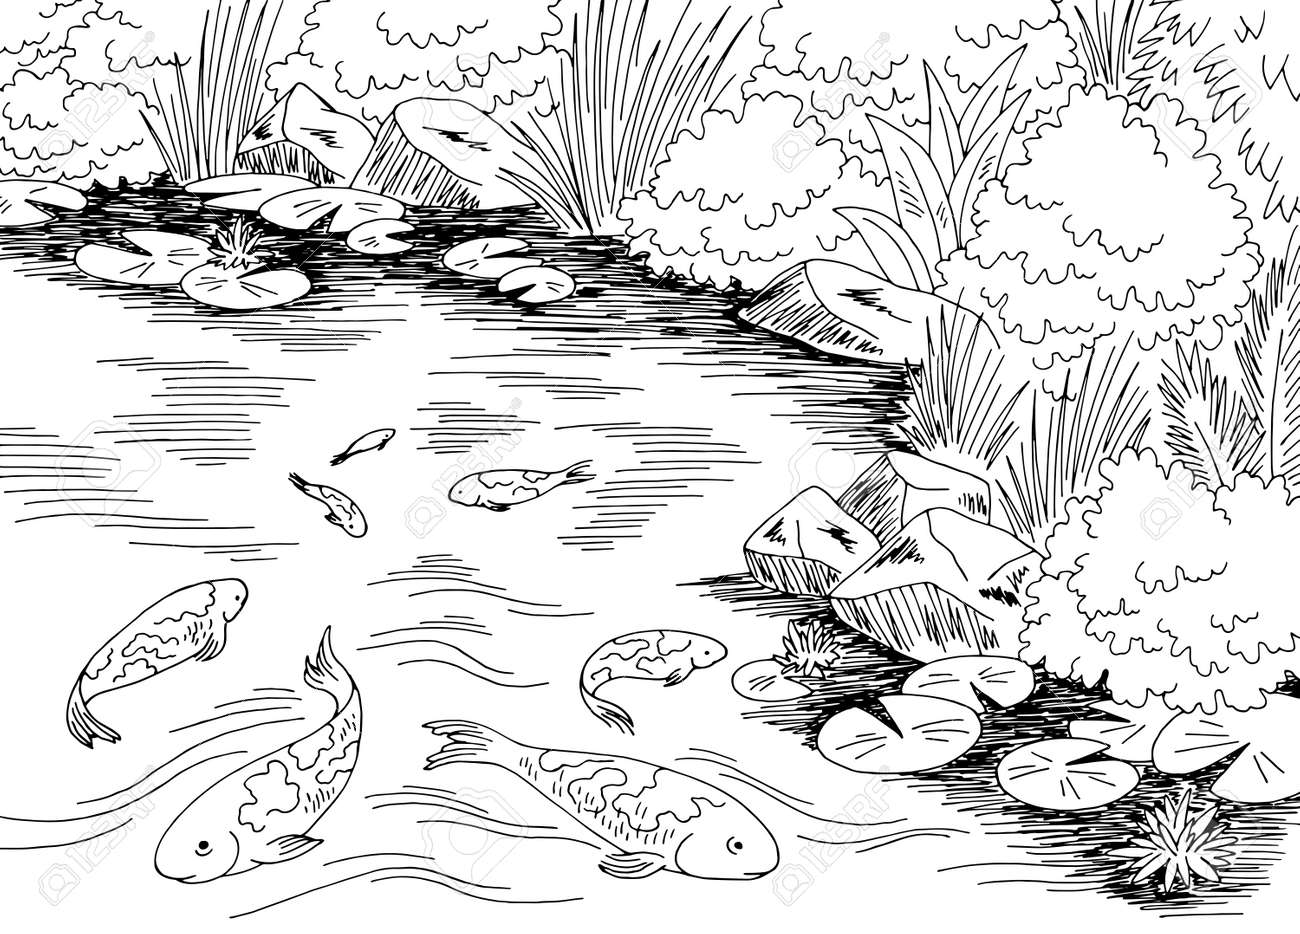 Pond koi carp fish graphic black white landscape sketch illustration vector - 140615329